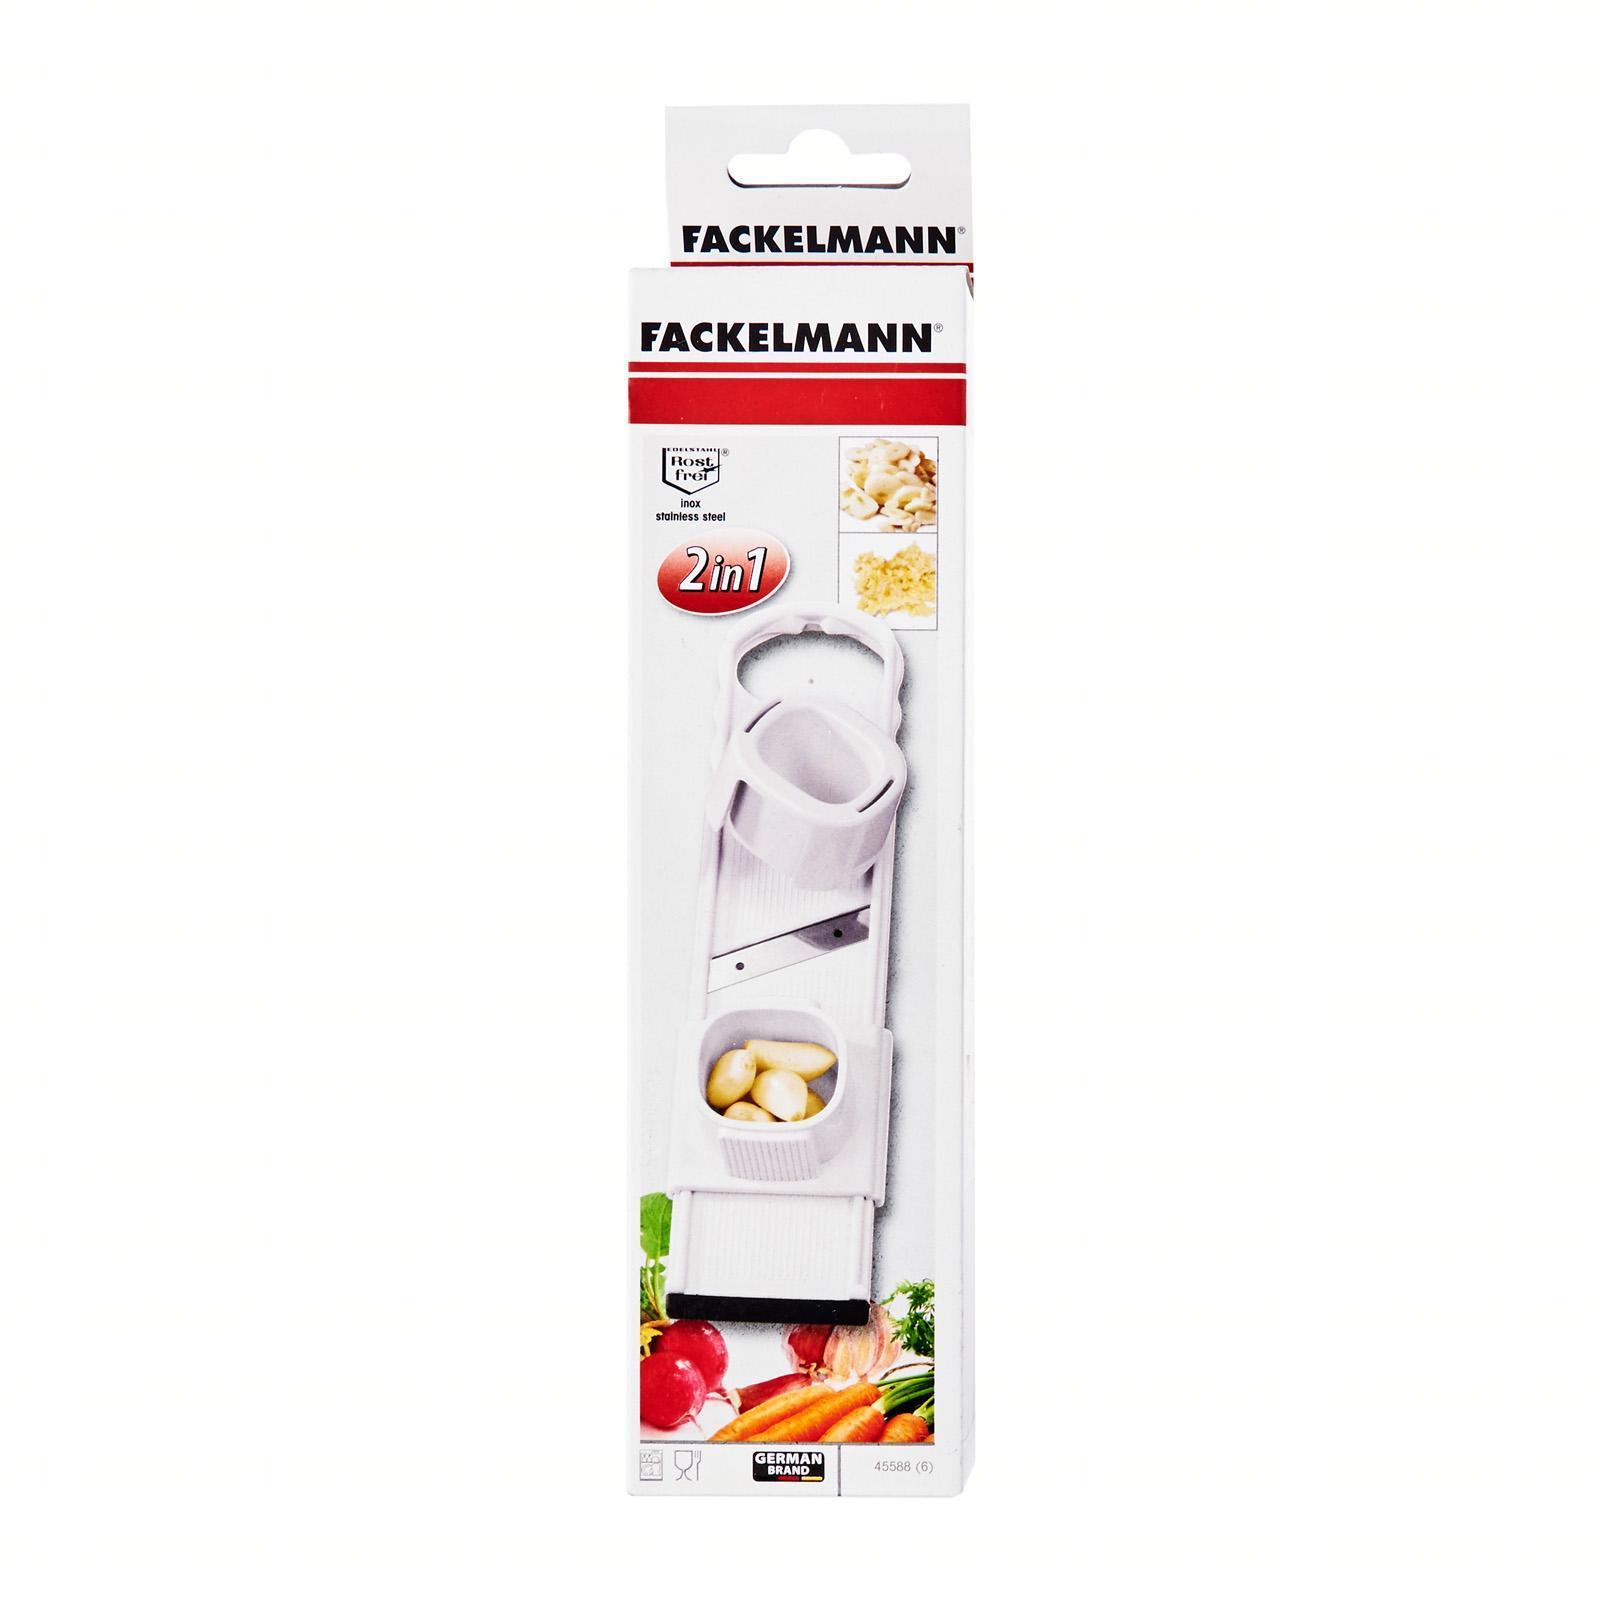 Fackelmann Garlic Slicer